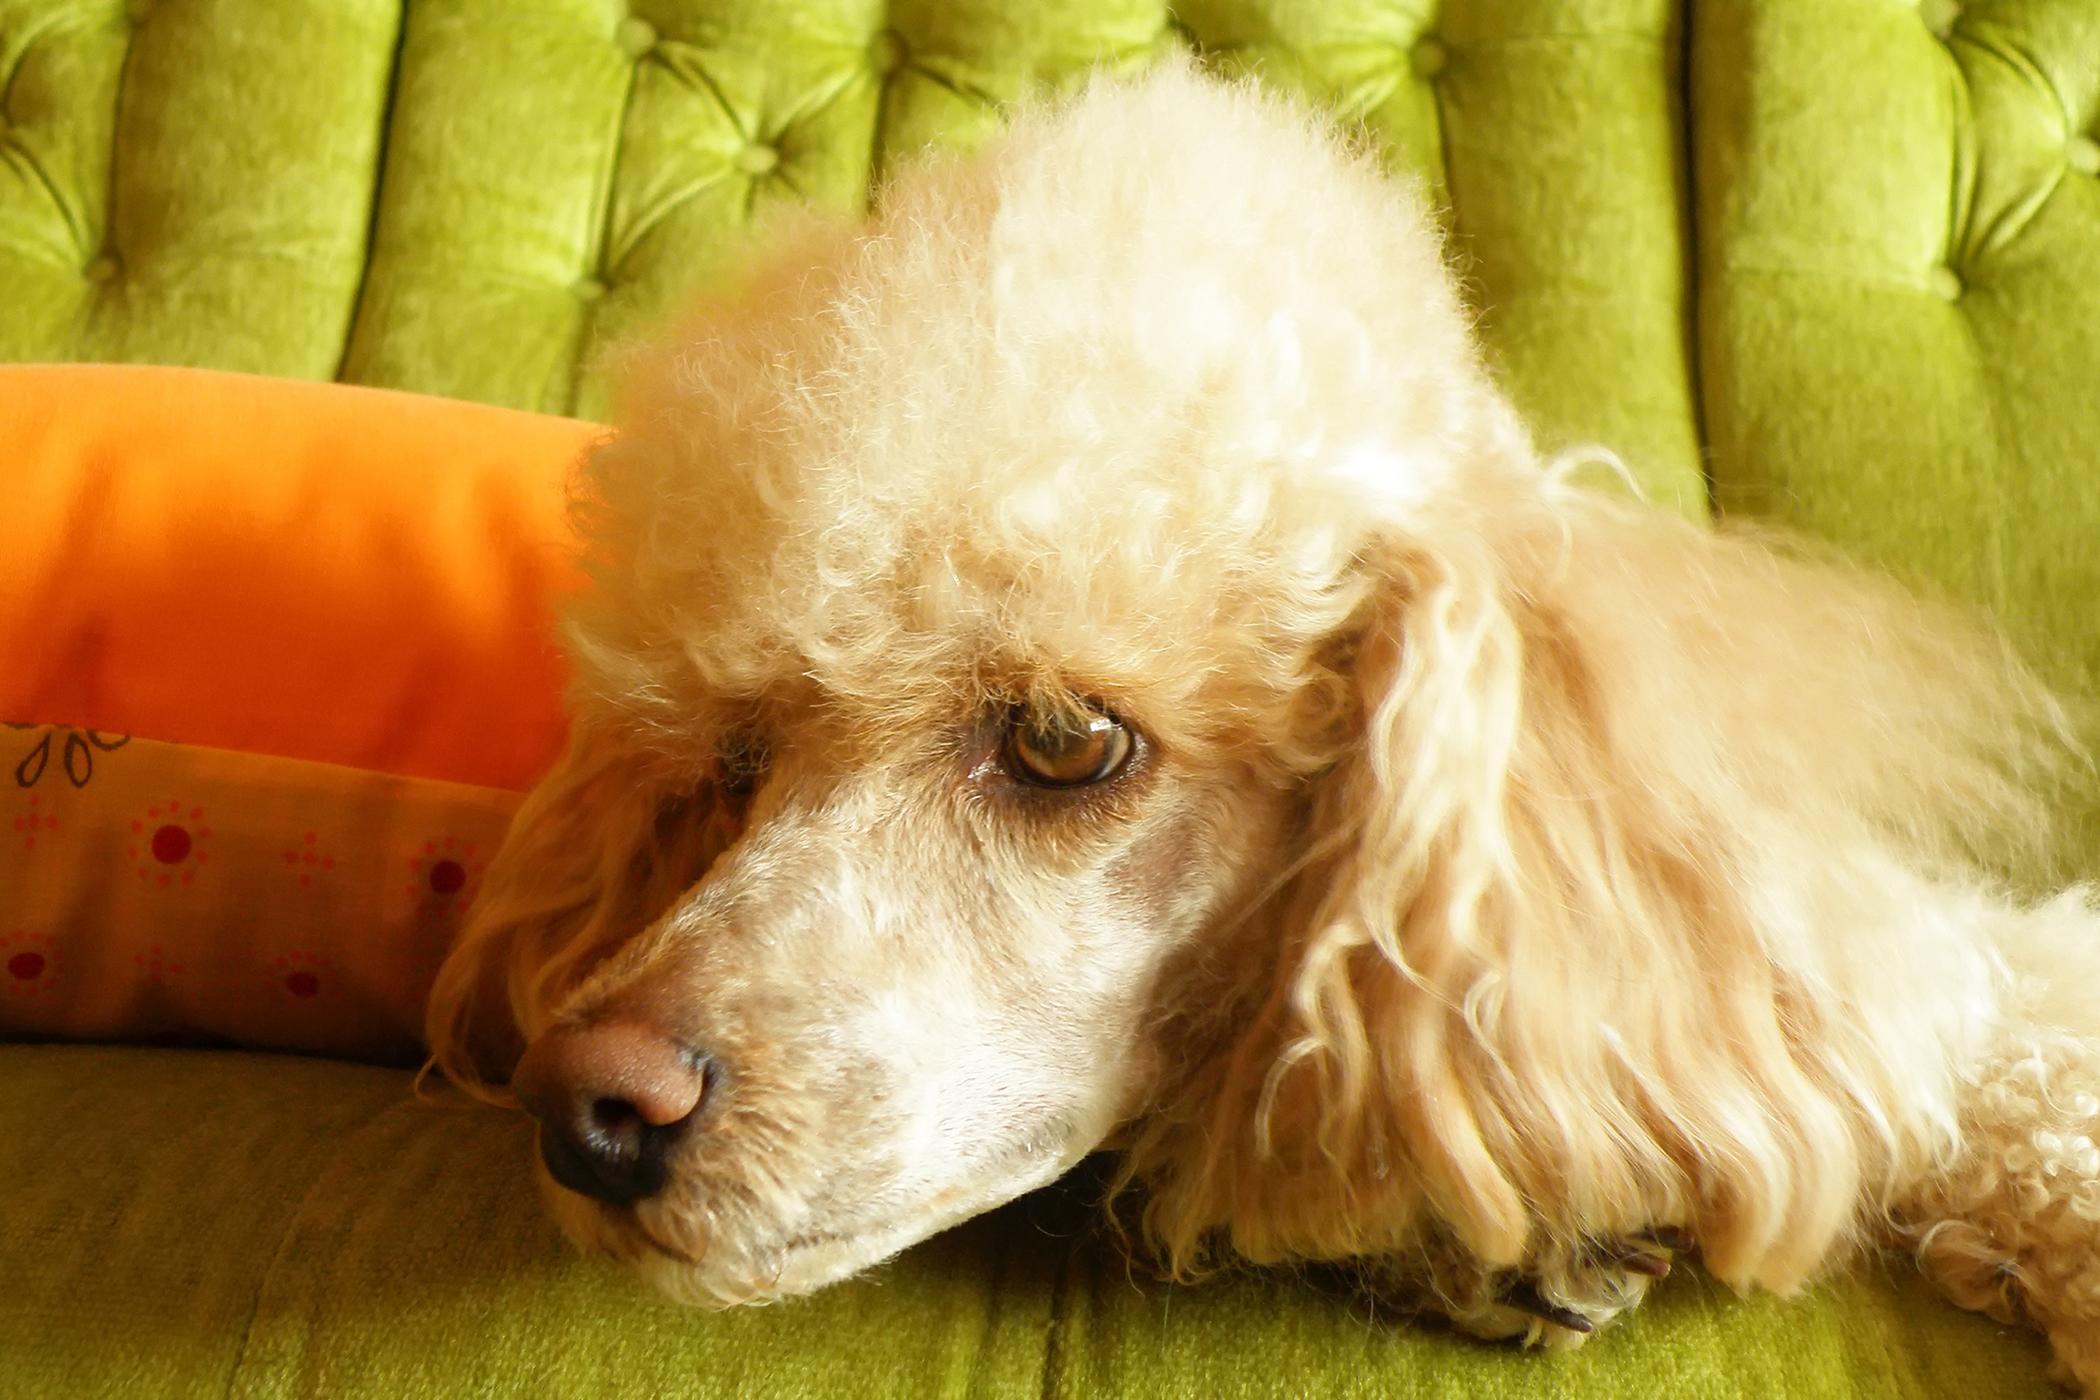 Fibular Head Transposition in Dogs